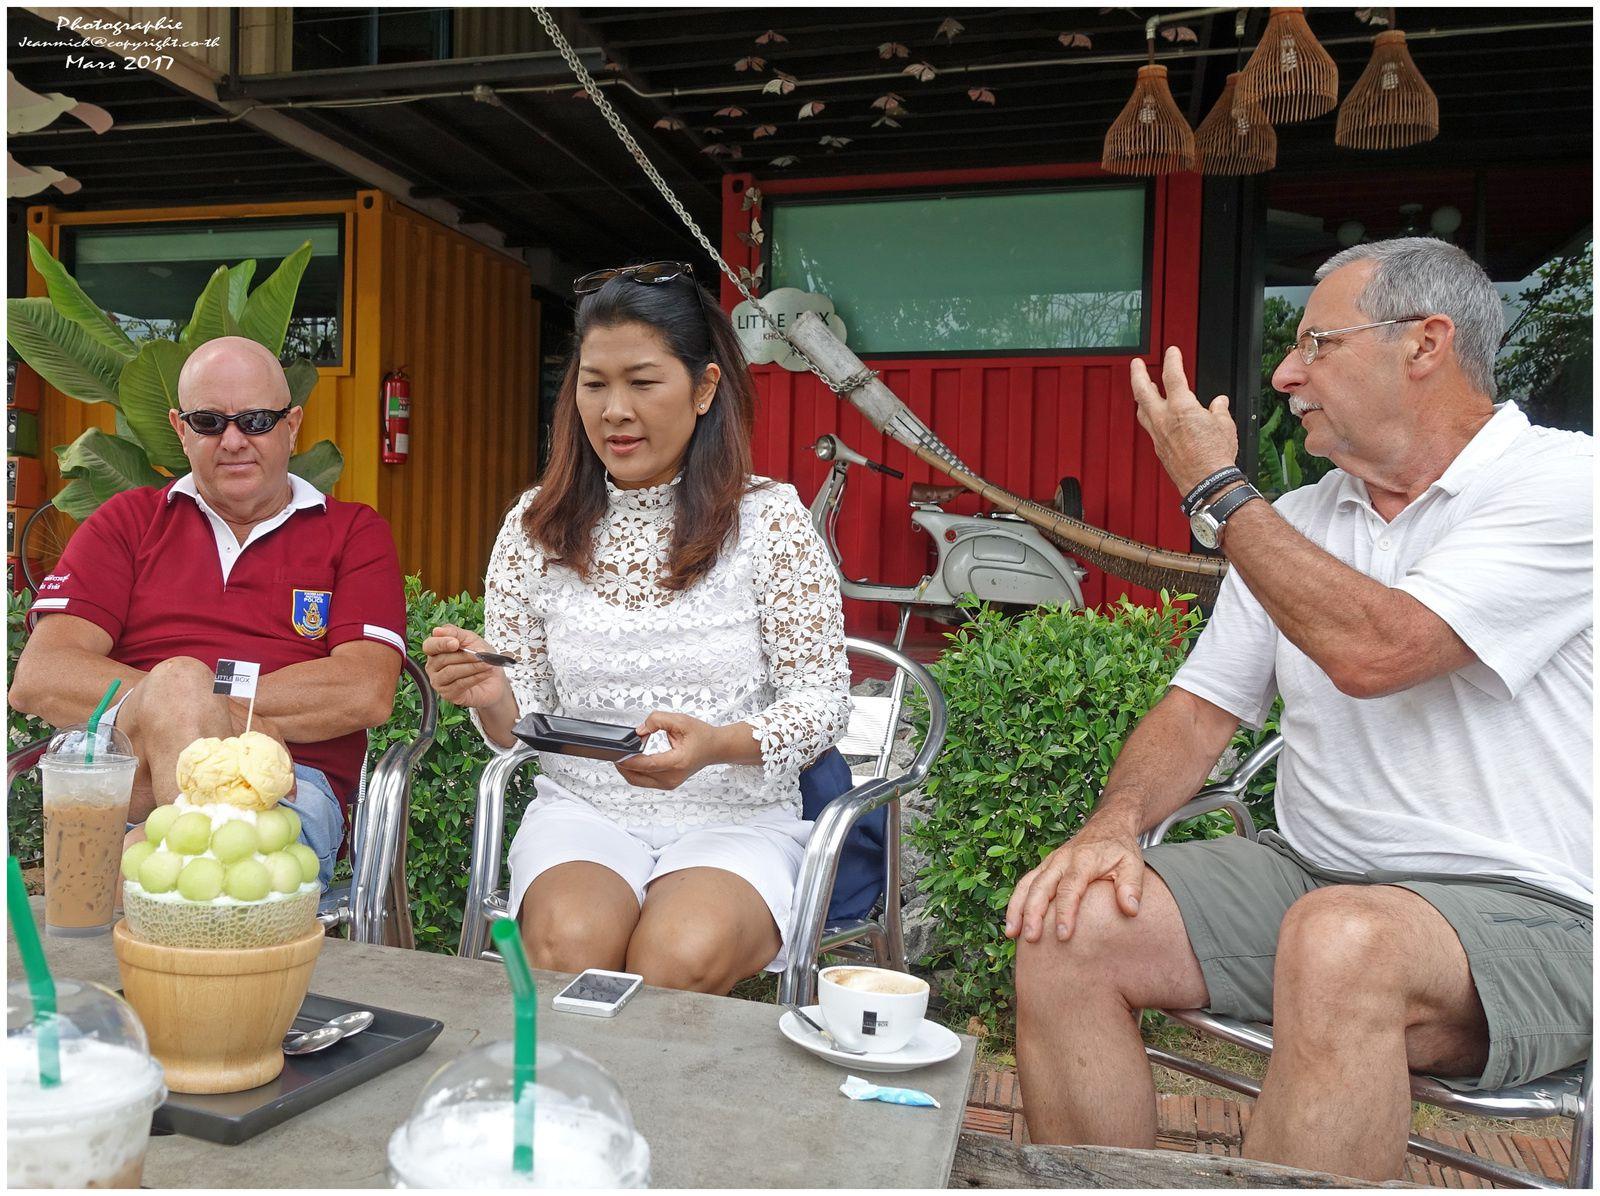 Un bon moment entre amis (Thaïlande)